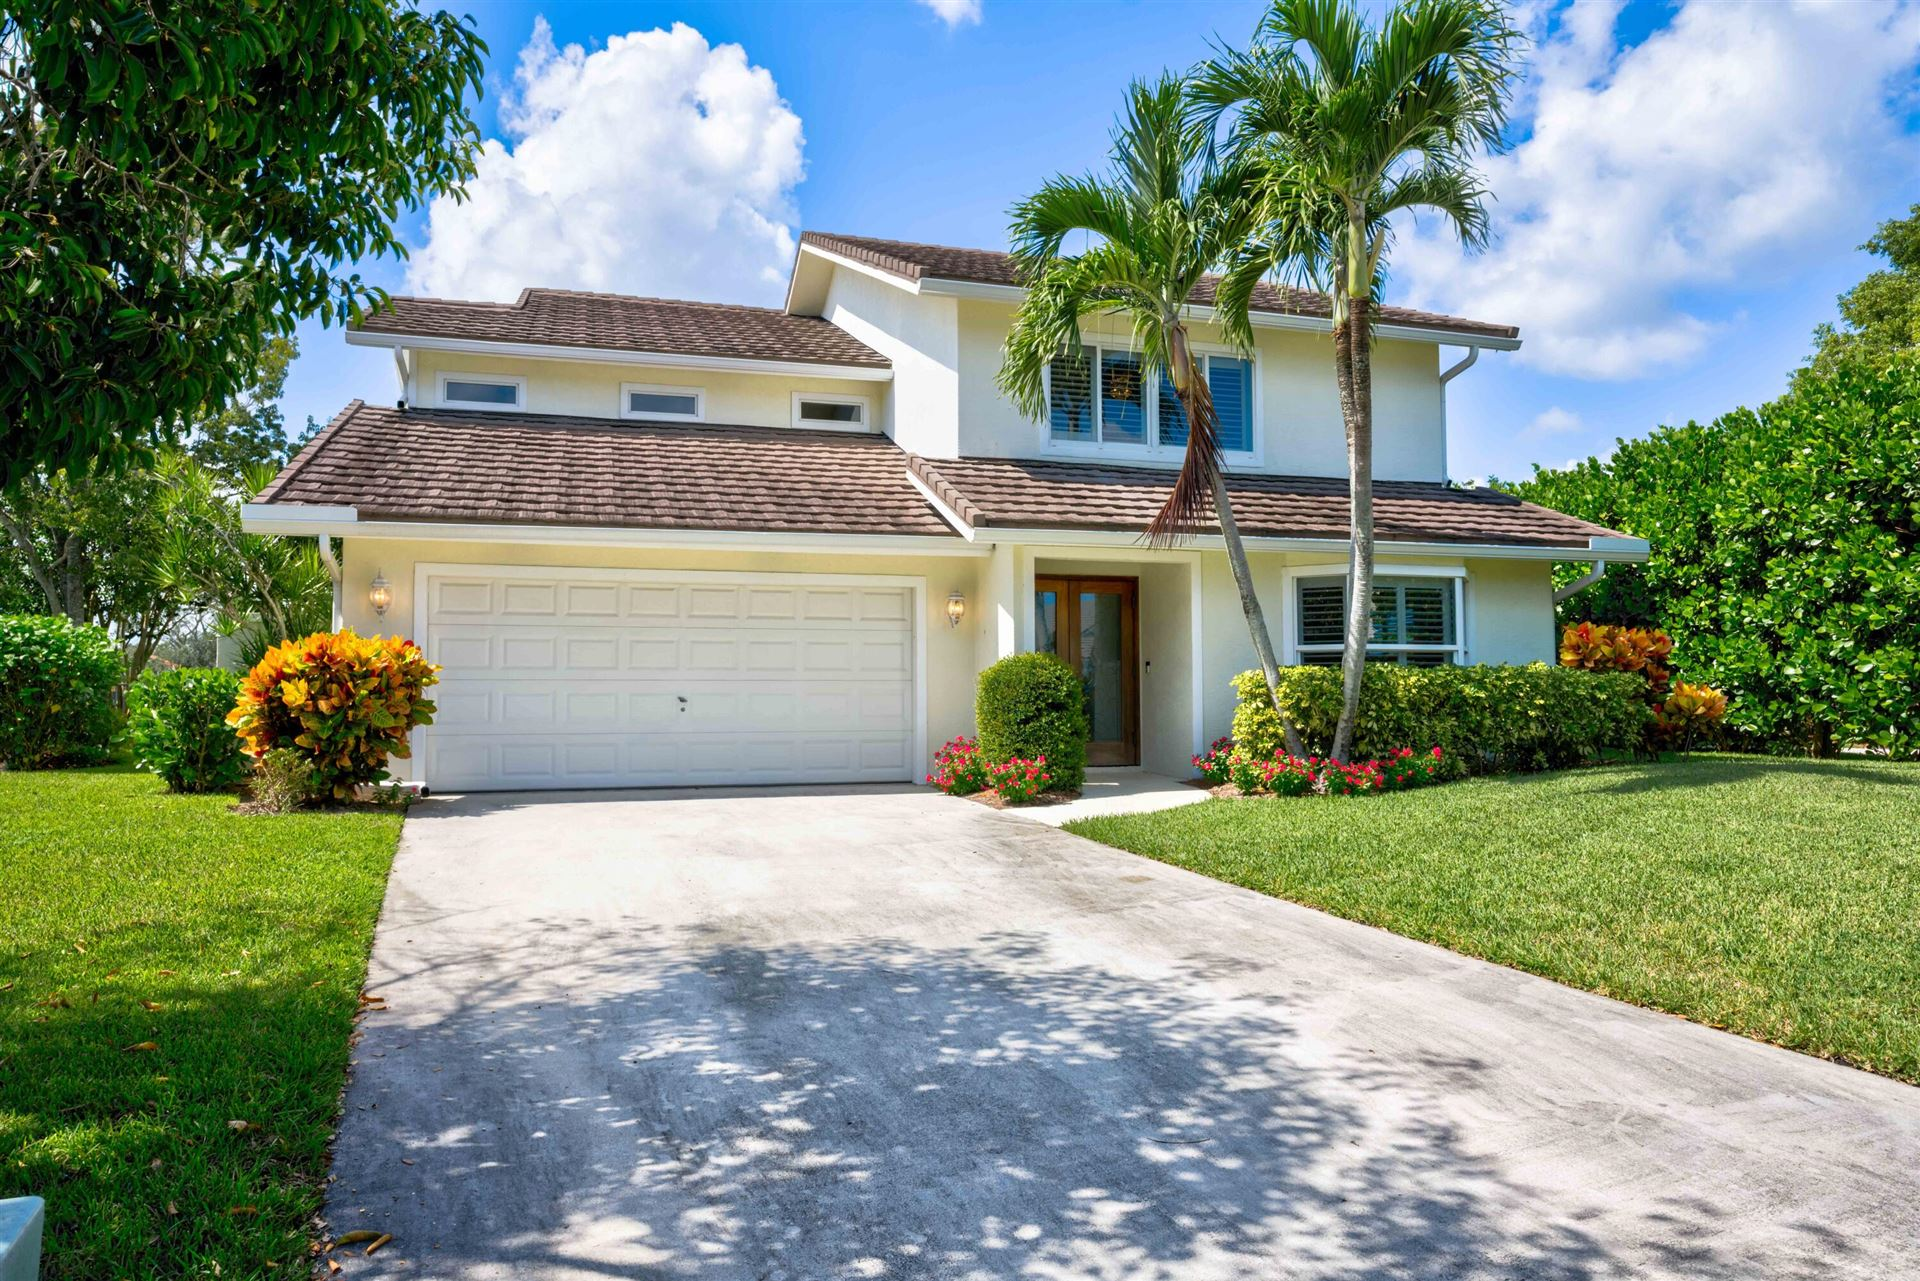 Photo of 7 Lethington Road, Palm Beach Gardens, FL 33418 (MLS # RX-10749294)